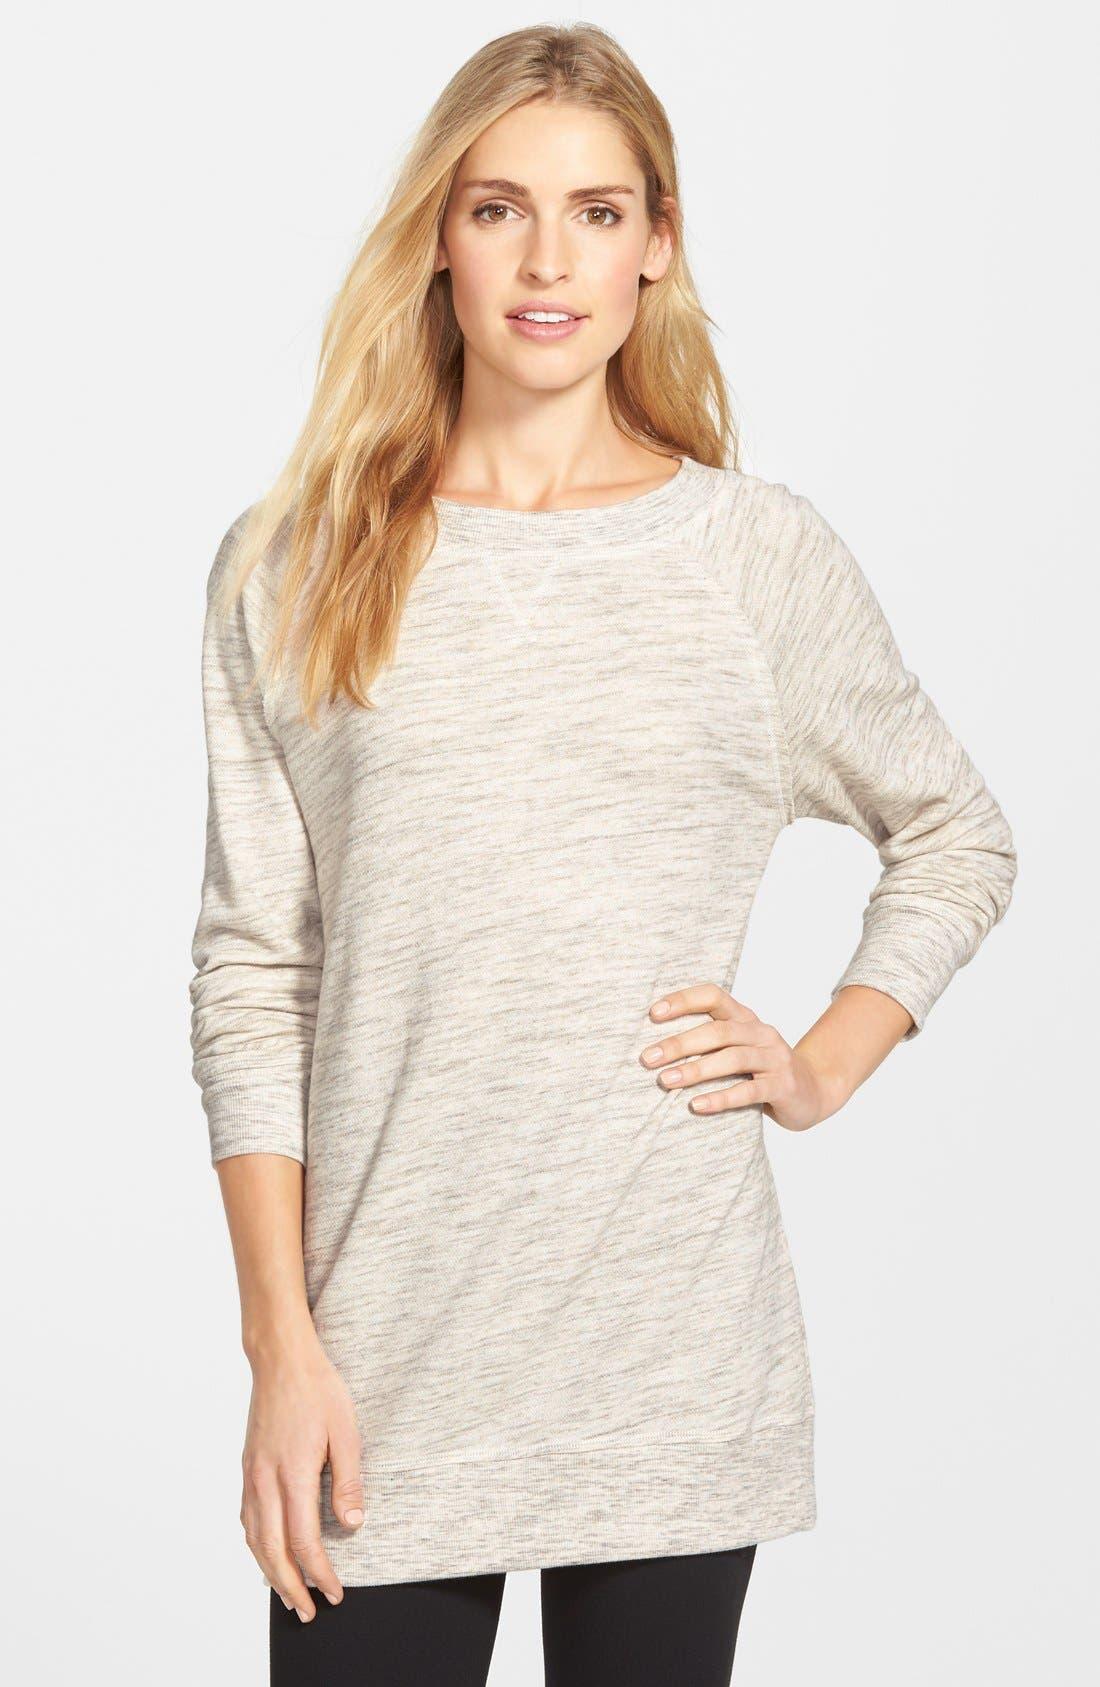 Alternate Image 1 Selected - Caslon® Space Dye Tunic Sweatshirt (Regular & Petite)